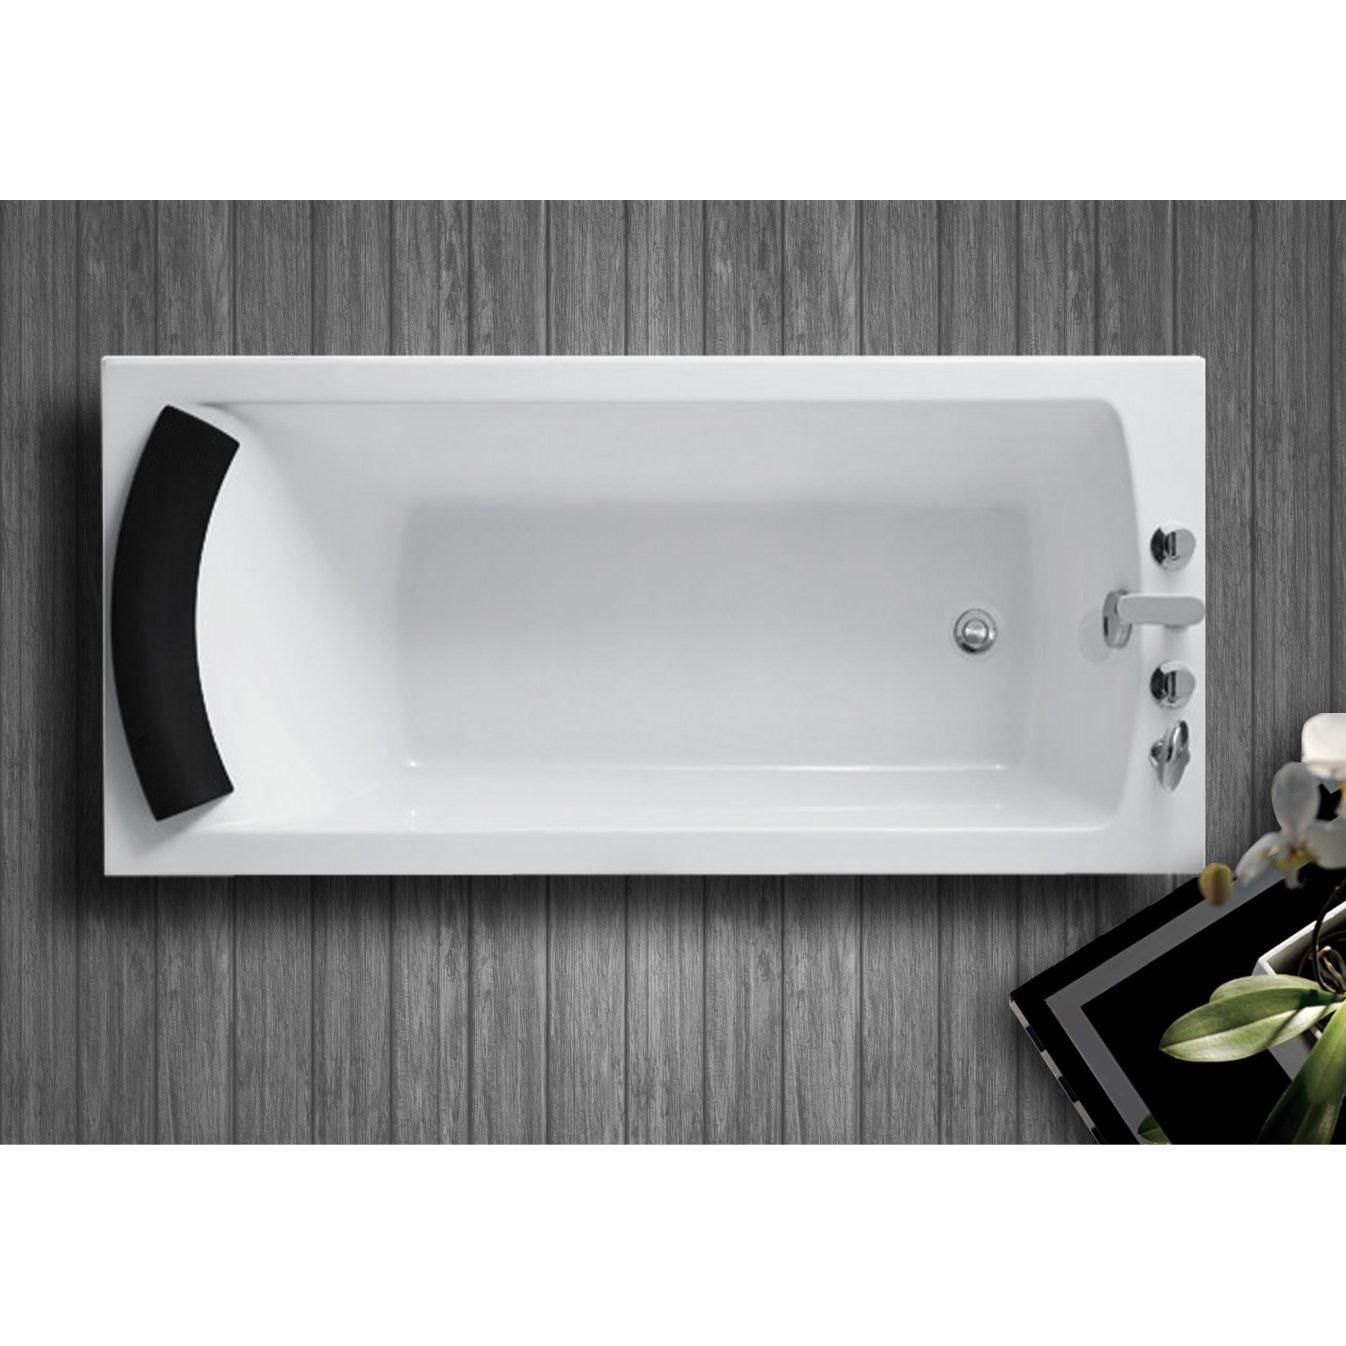 Акриловая ванна Royal bath Vienna RB953202 160х70 каркас сварной к ванне royal bath vienna 140 rb953200k